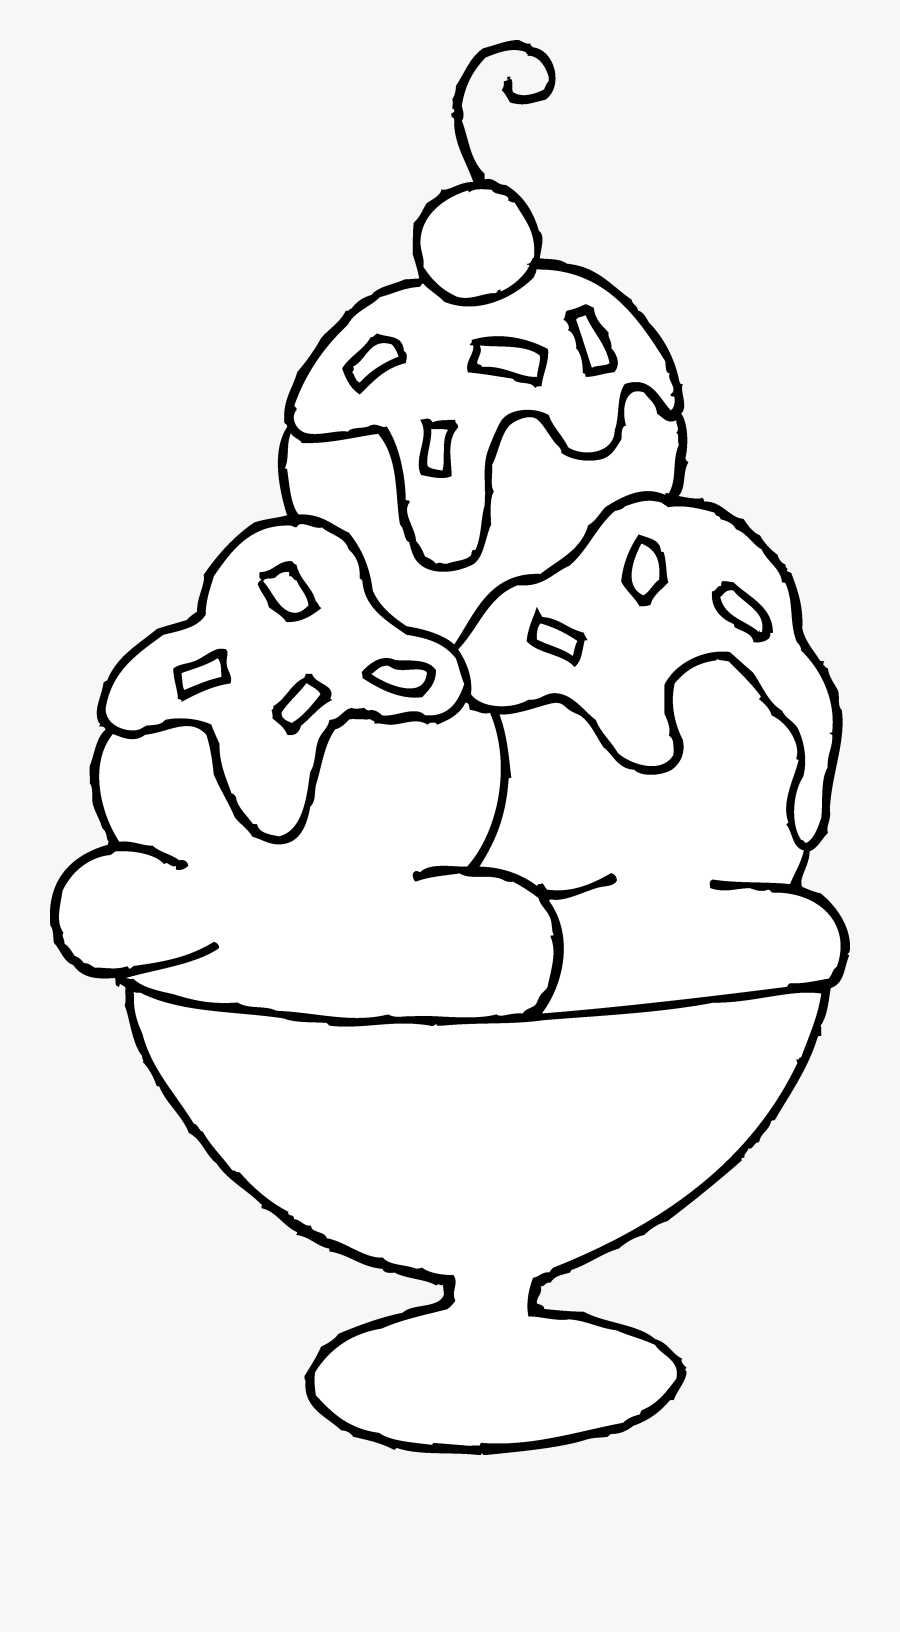 Ice Cream Sundae Coloring Page - Ice Cream Sundae Drawing Easy, Transparent Clipart